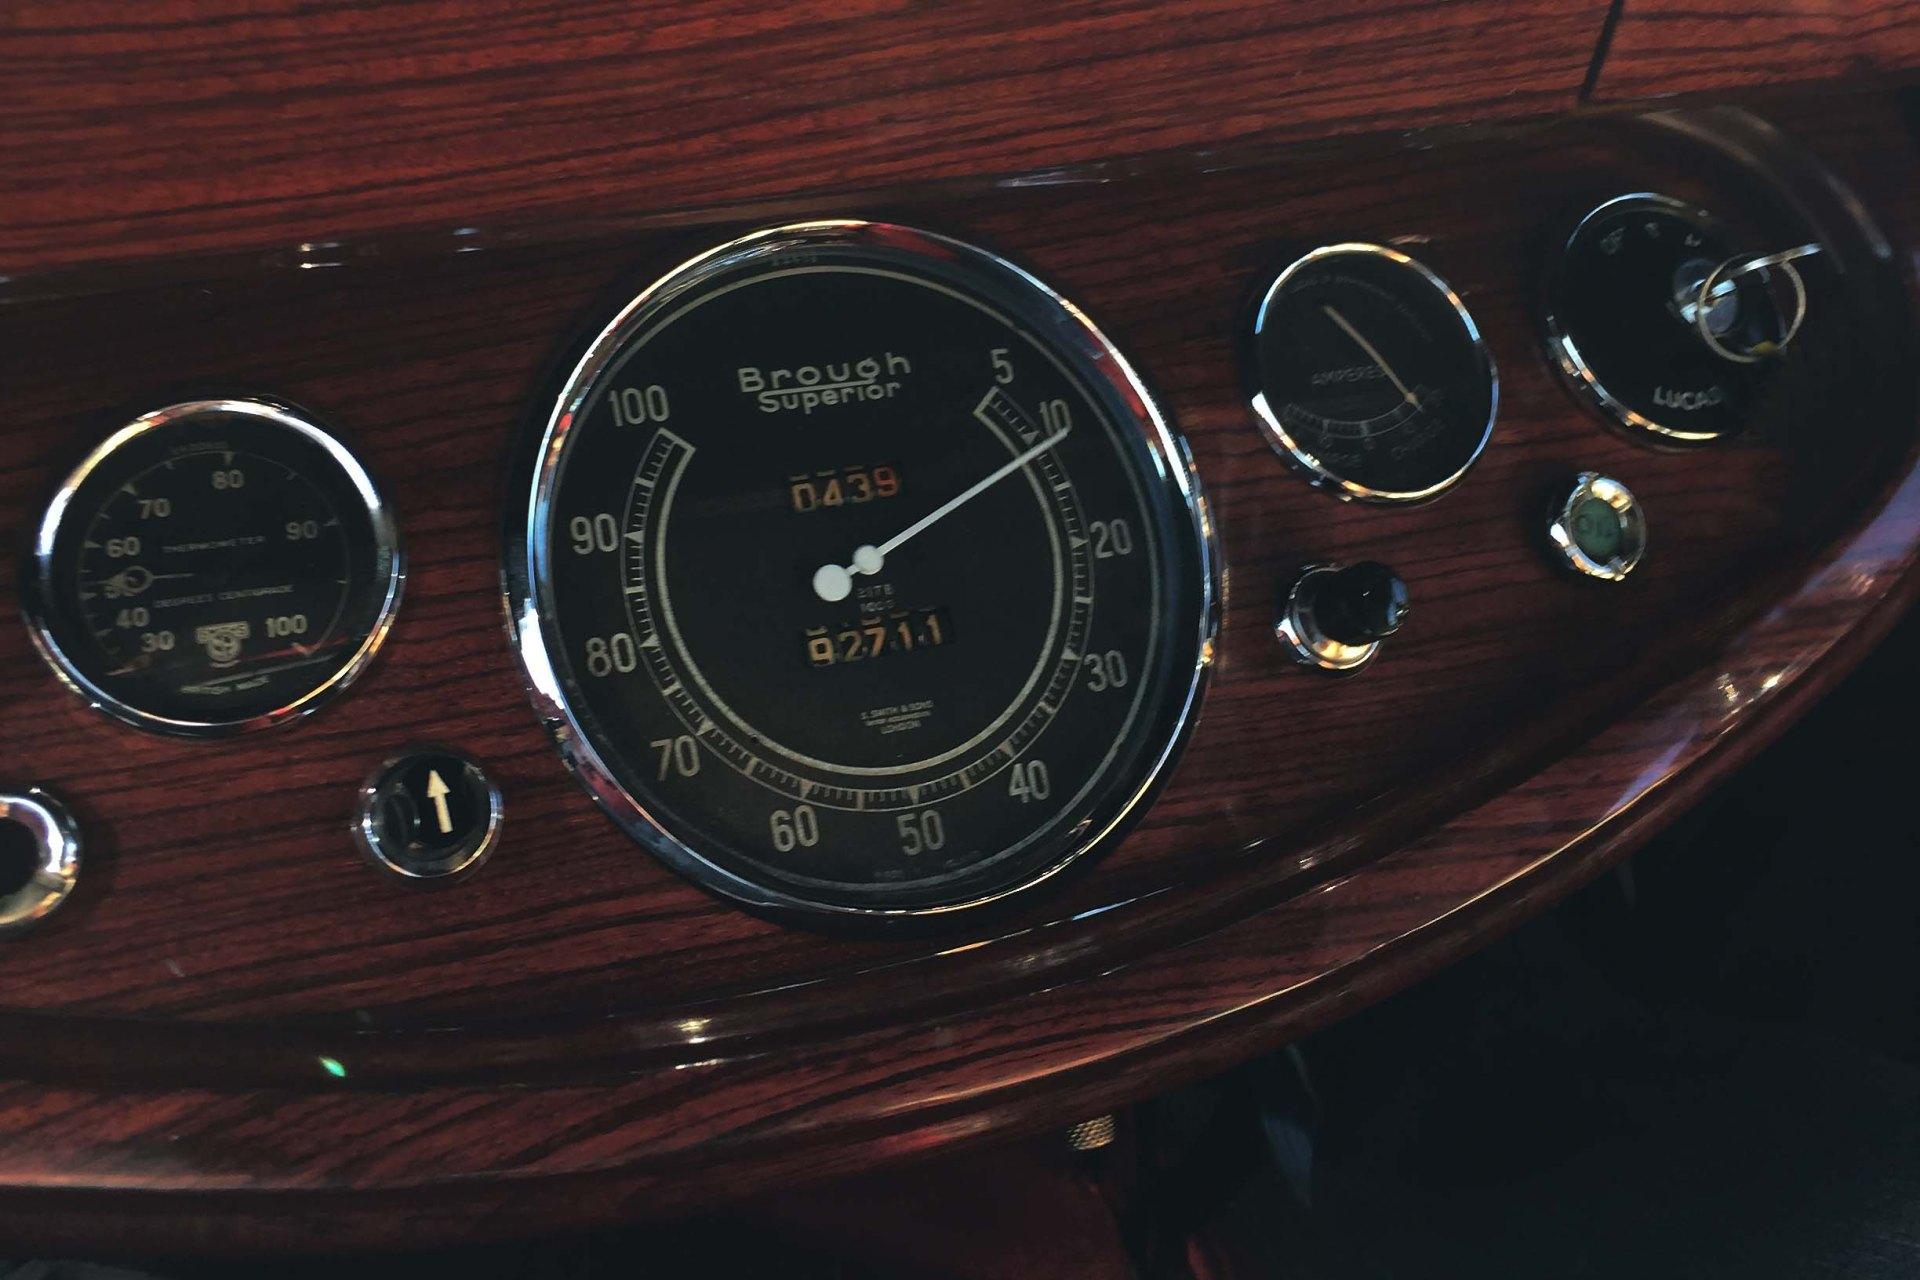 Brough Superior instrument panel. Photo by Simon Aldridge.